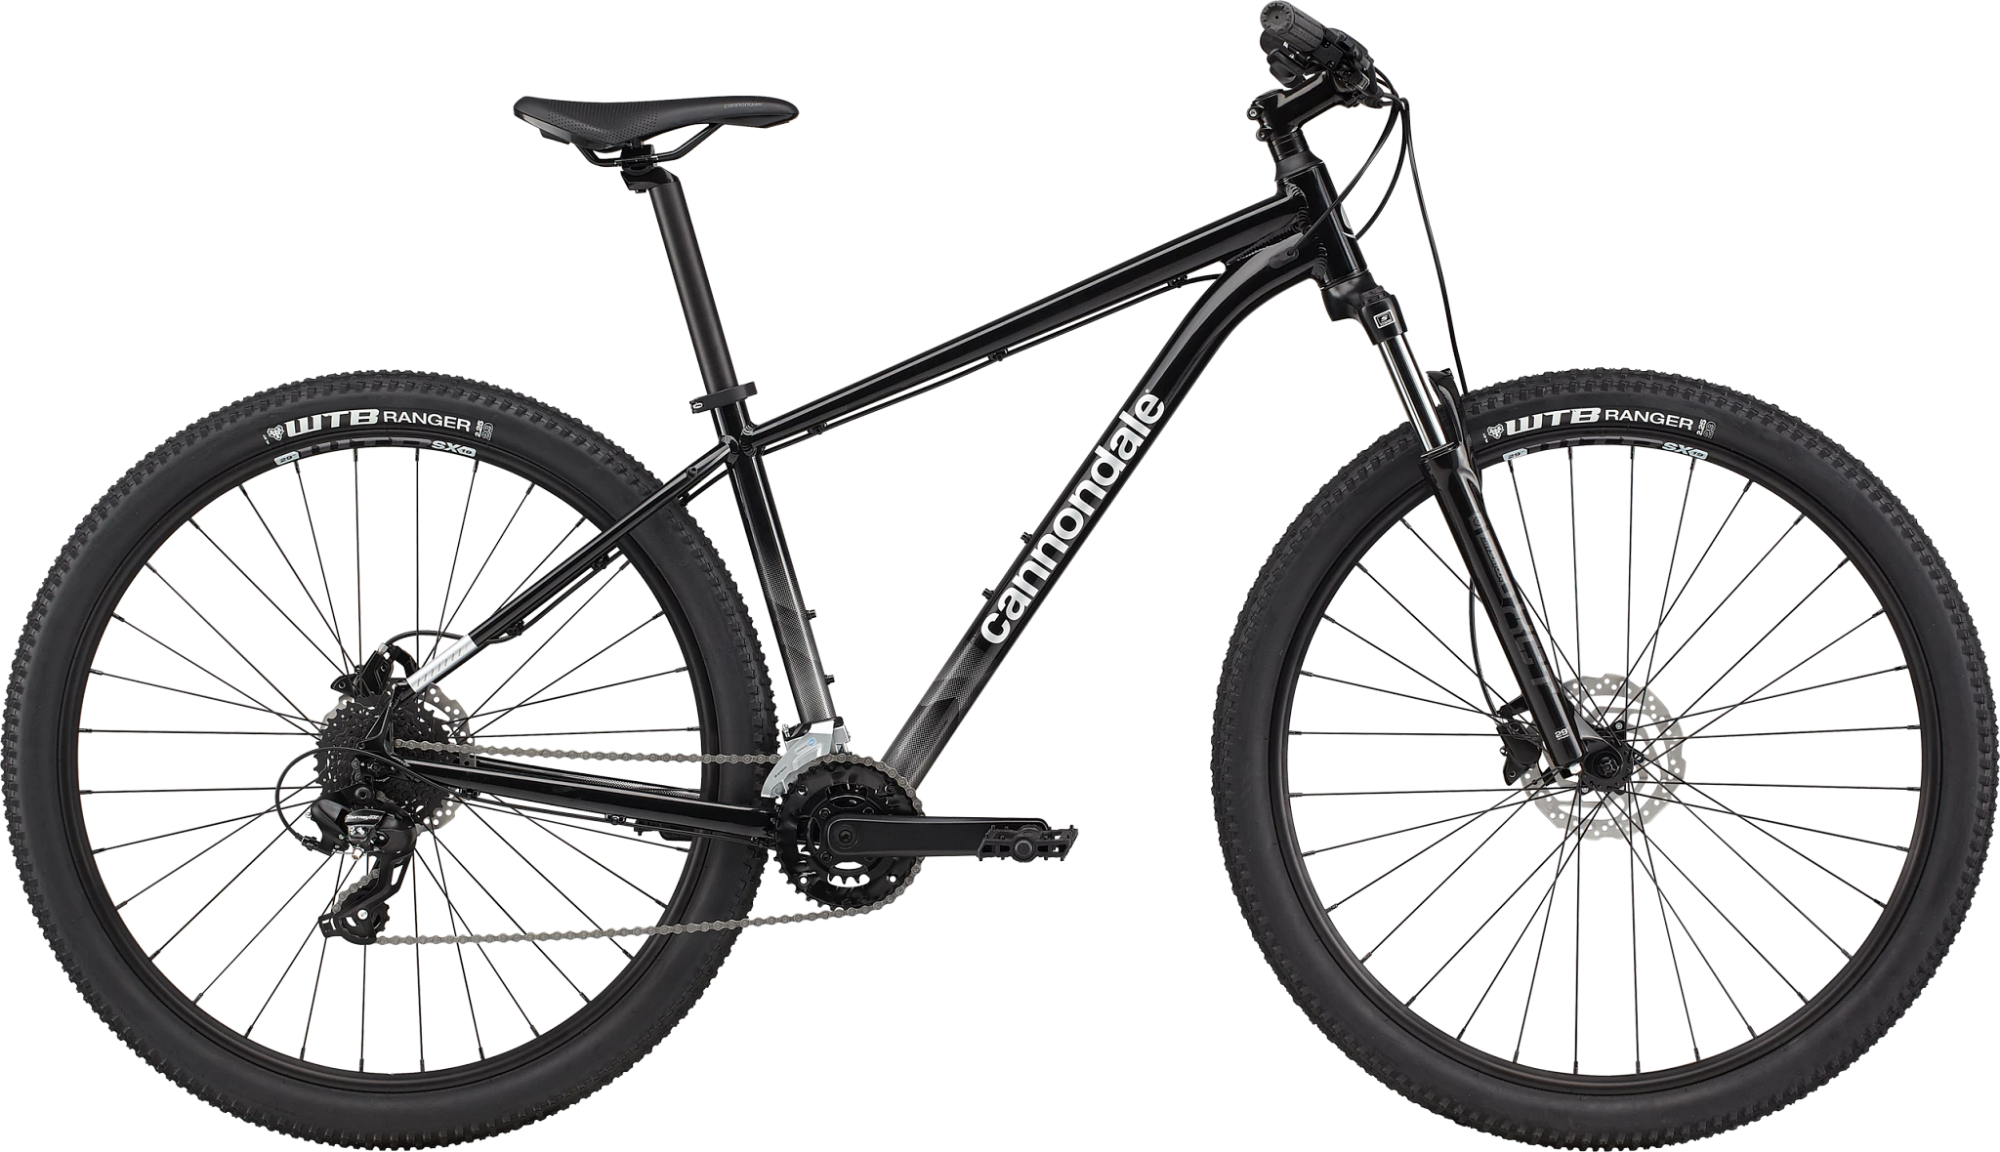 Cannondale Trail 7 Hardtail Mountain Bike 2021 Black